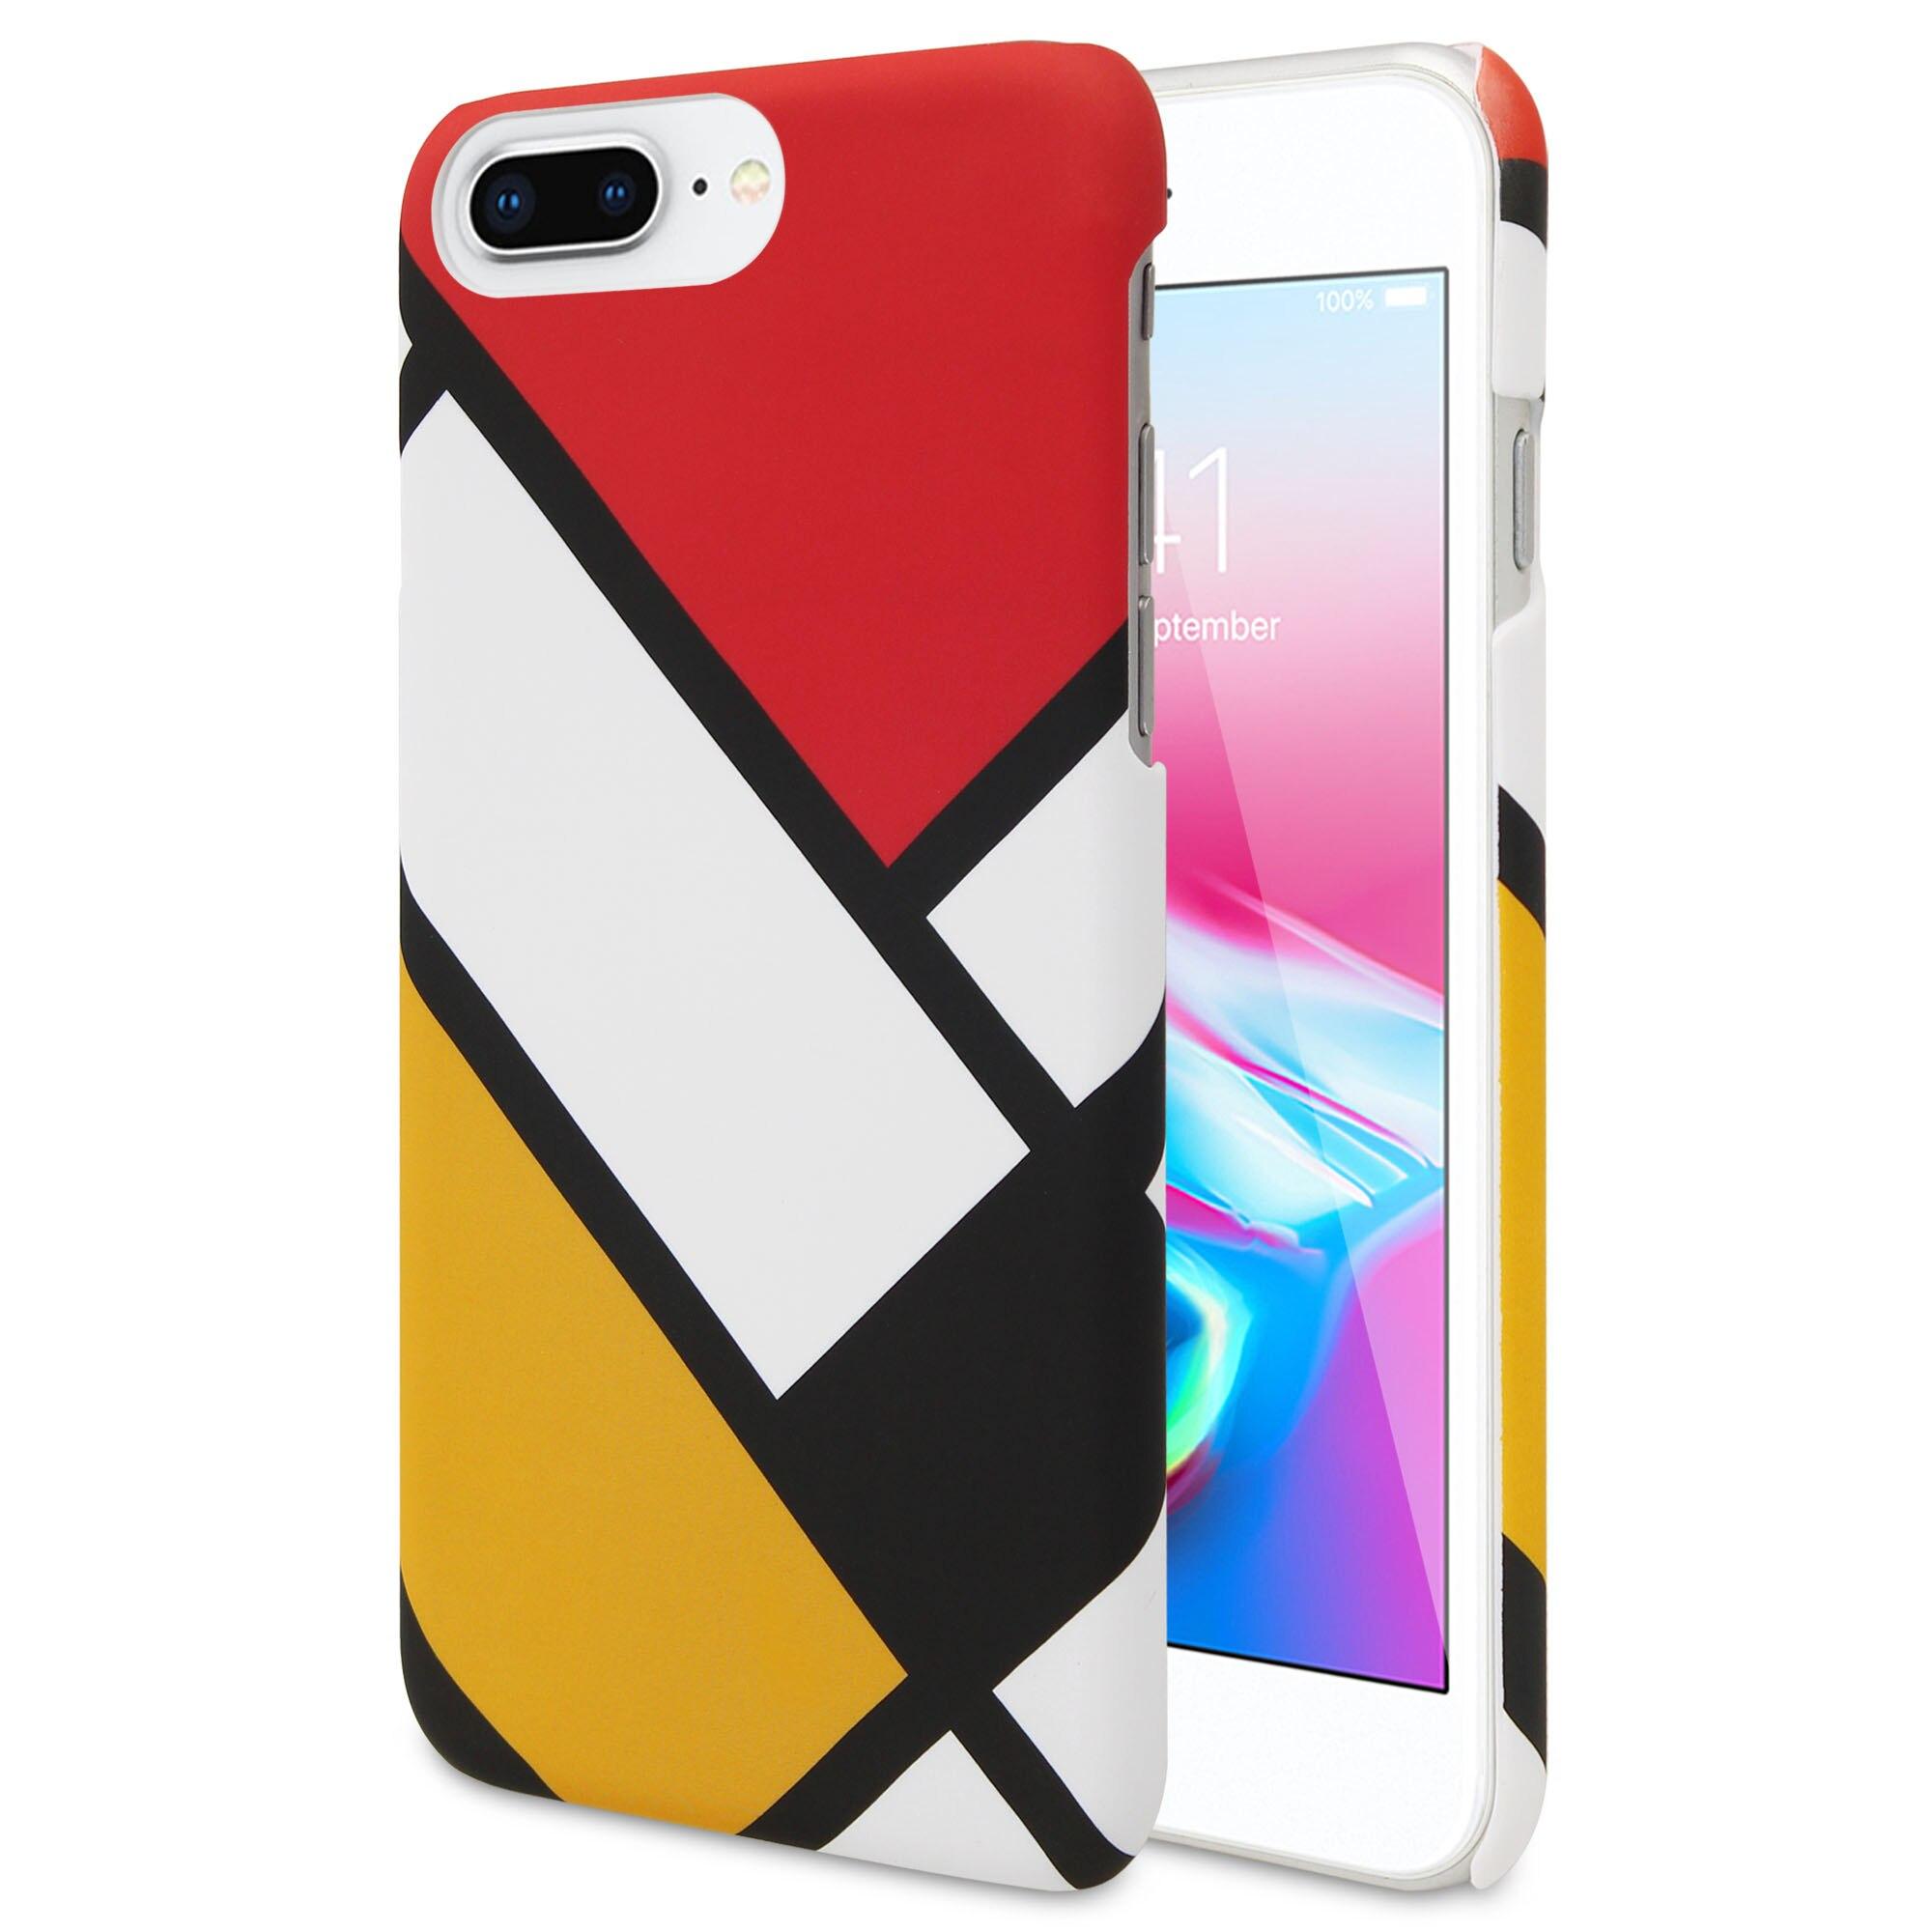 ANYLIFE coque arrière premium Anti-choc (avec motif sur les bords)//iphone 6 +/6s +/7 +/8 +-SQUARE4-